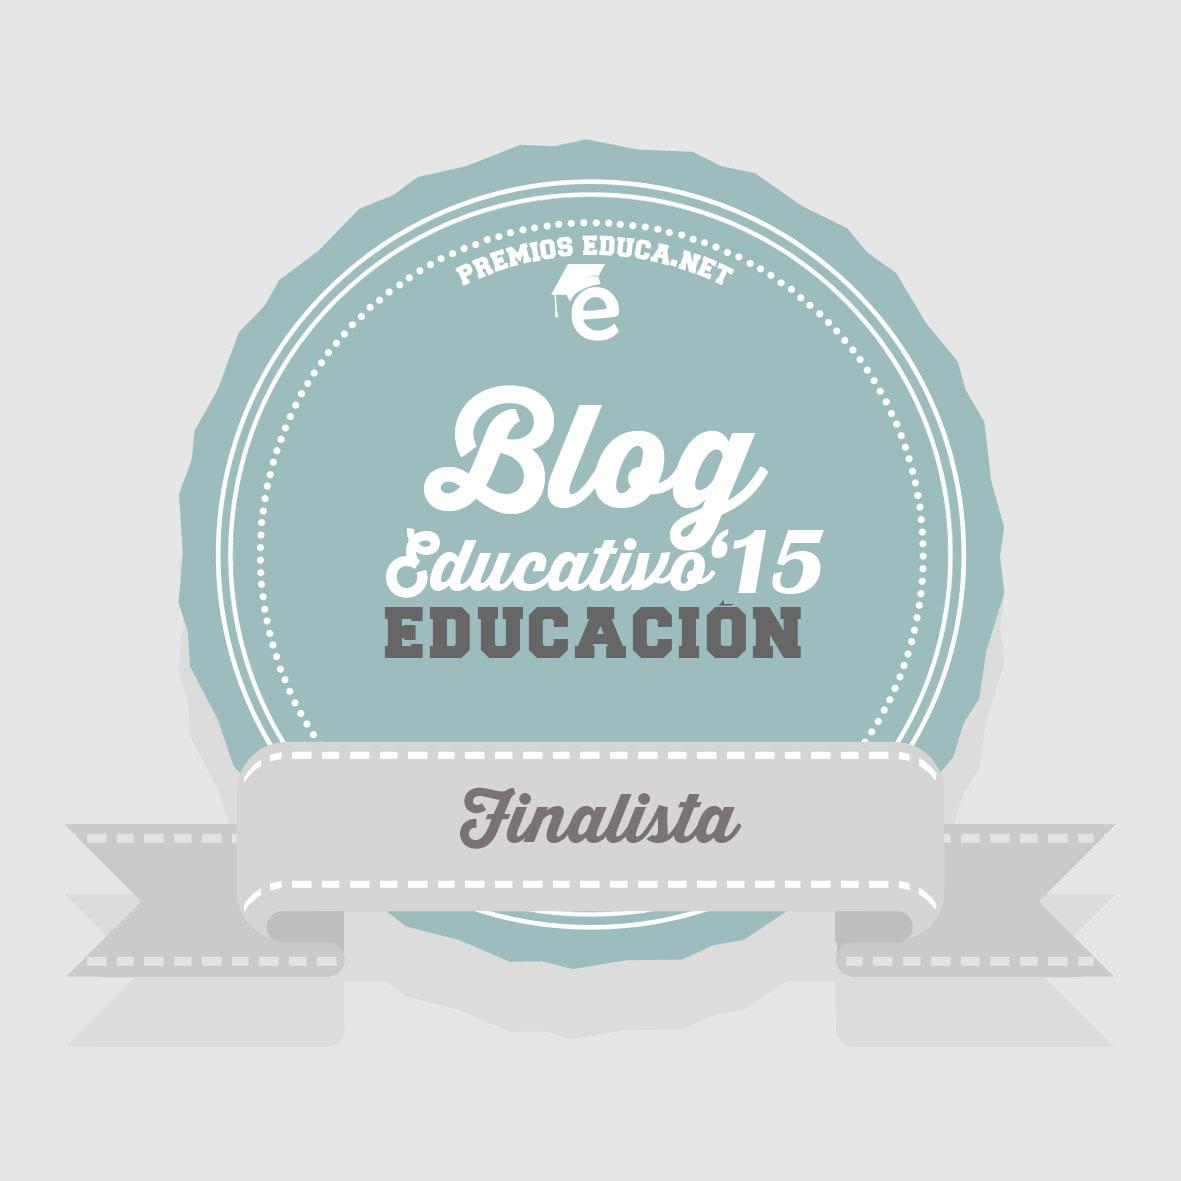 Finalistas Premios Educa.net